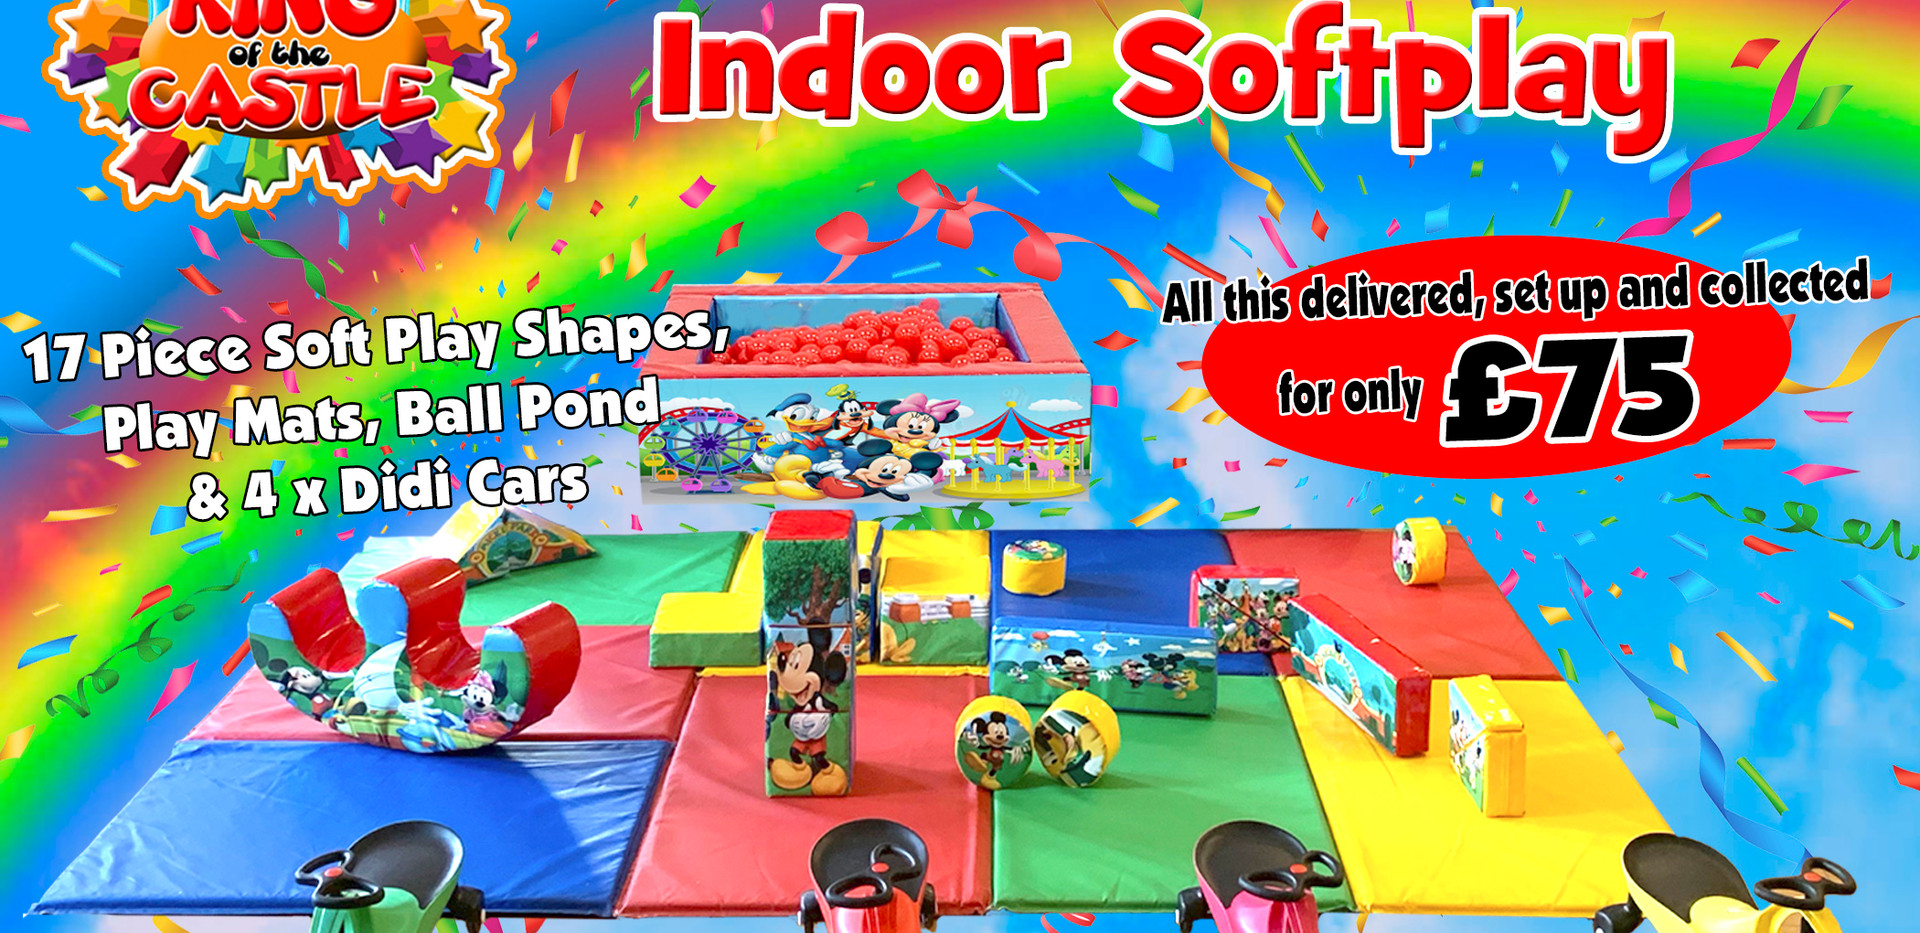 Soft Play - Mickey & Minnie Softplay.jpg